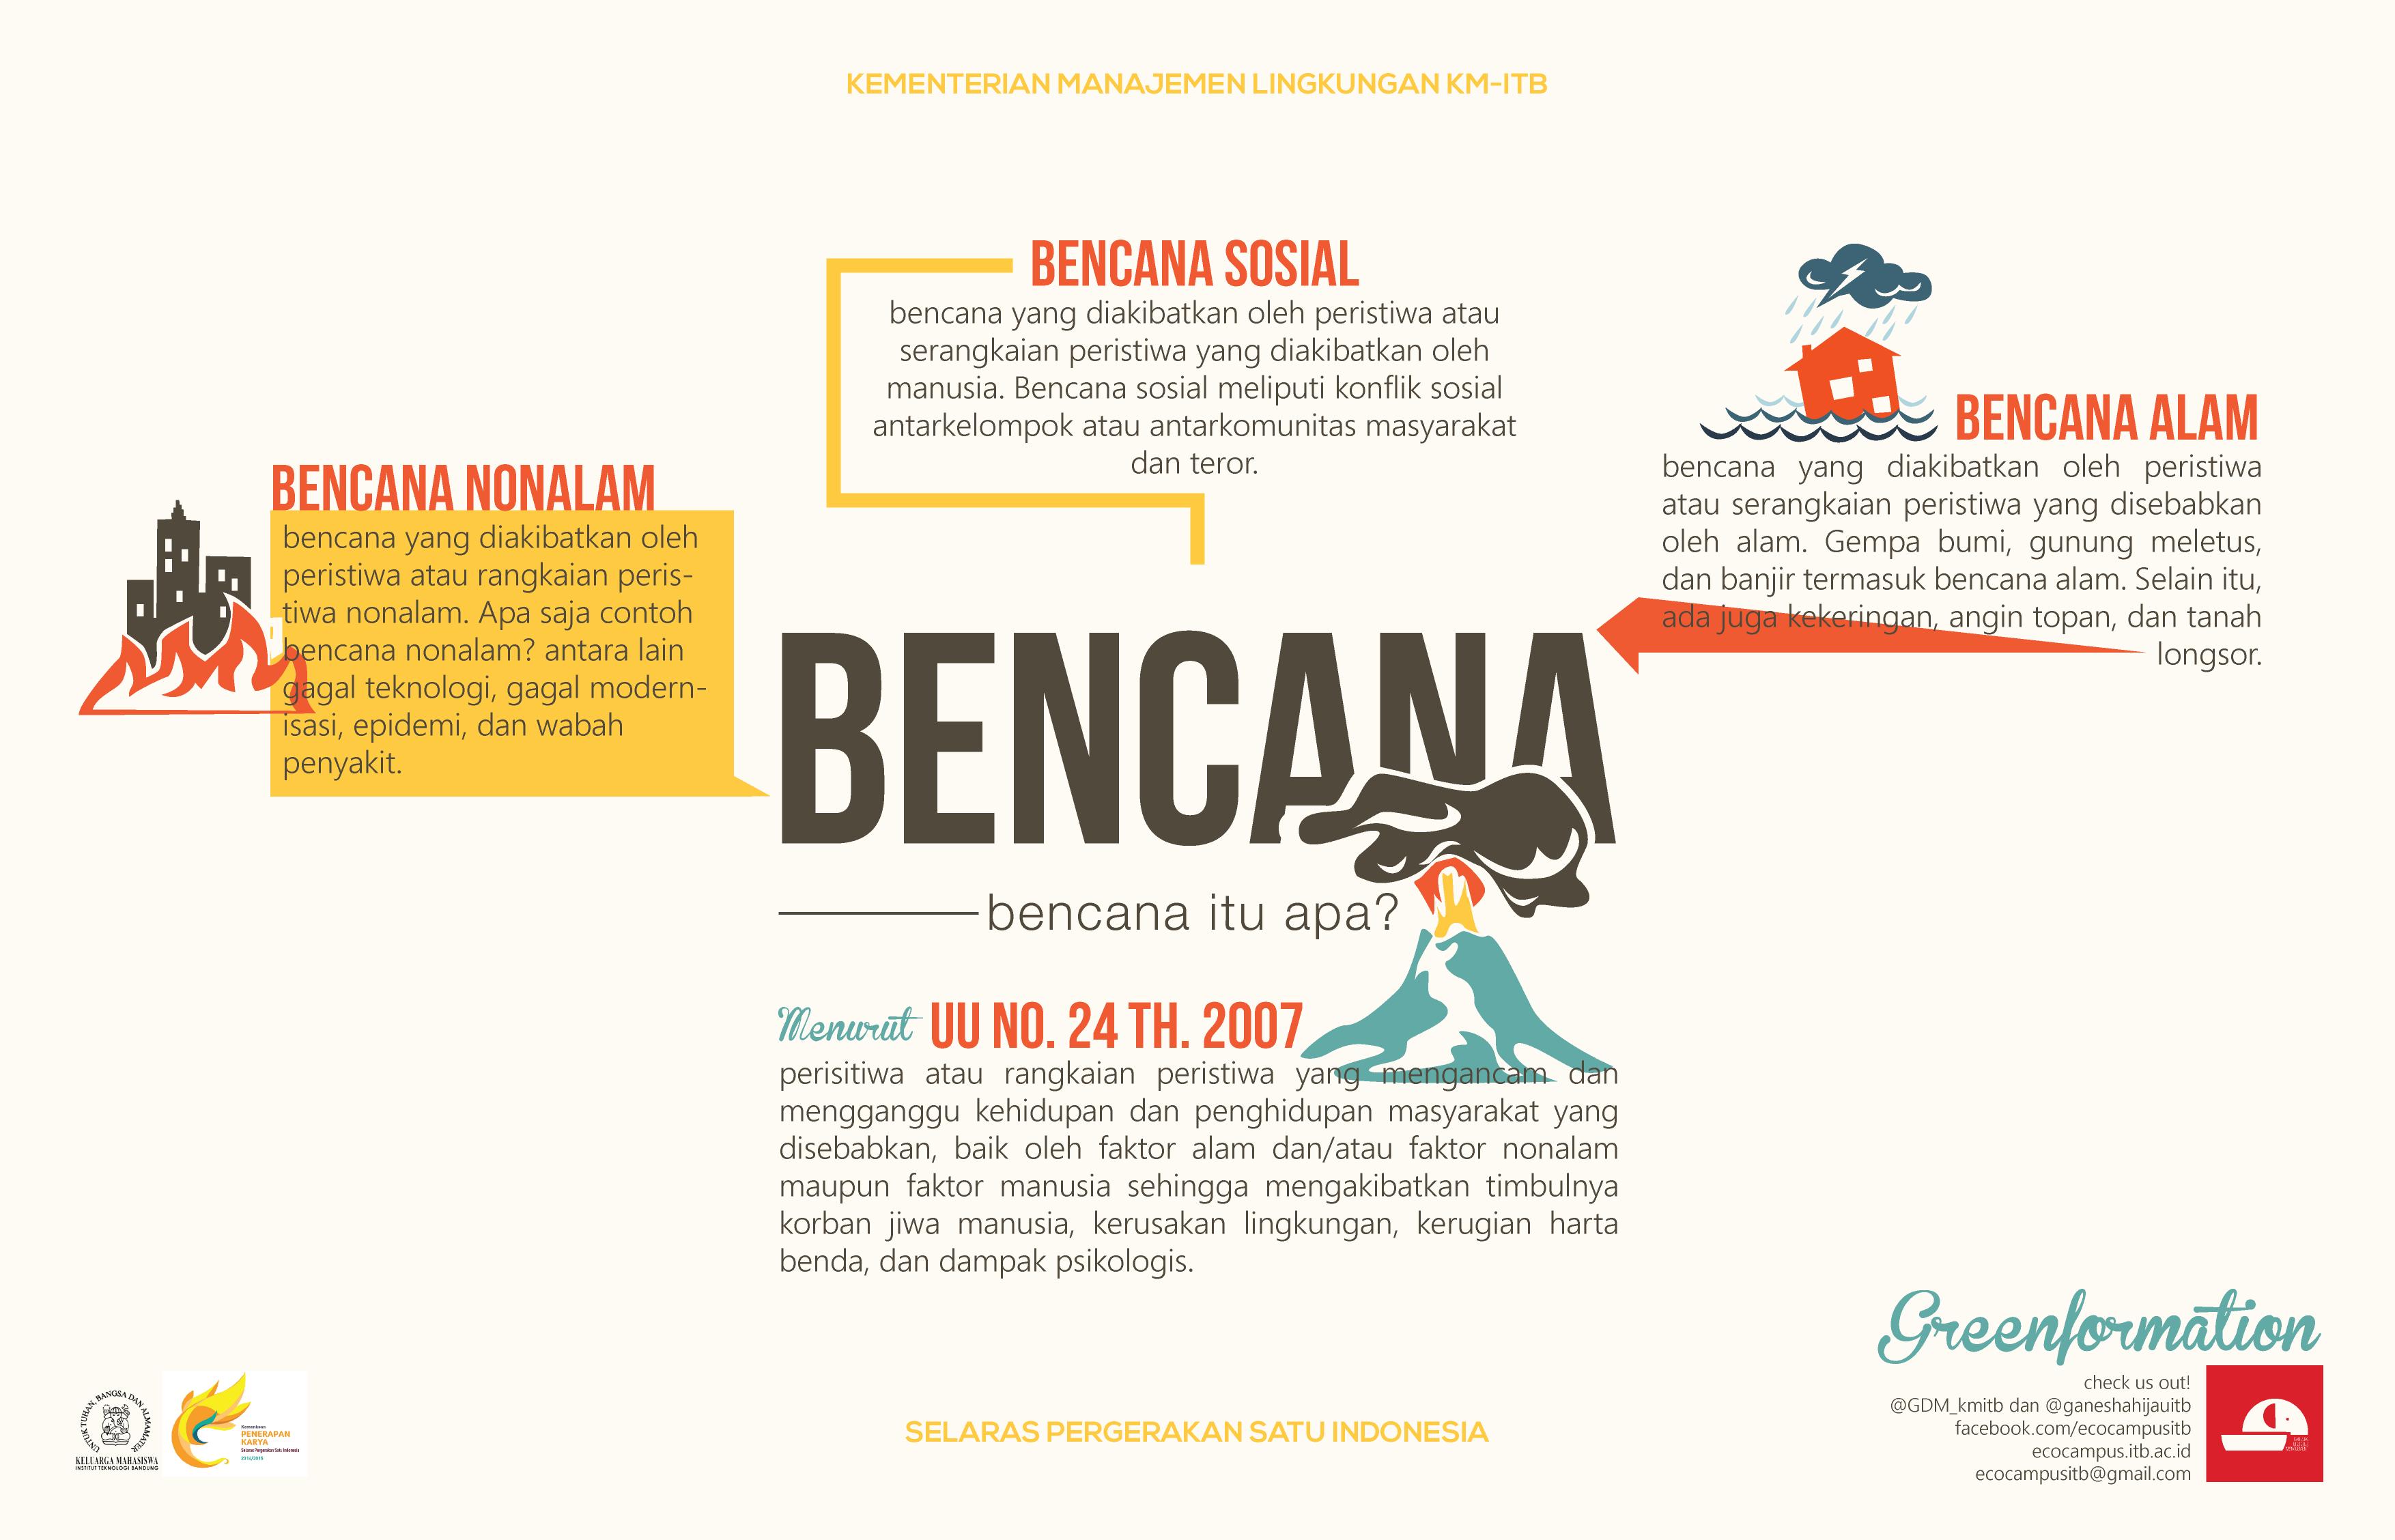 Greenformation Disaster Edition Poster Design Kementerian